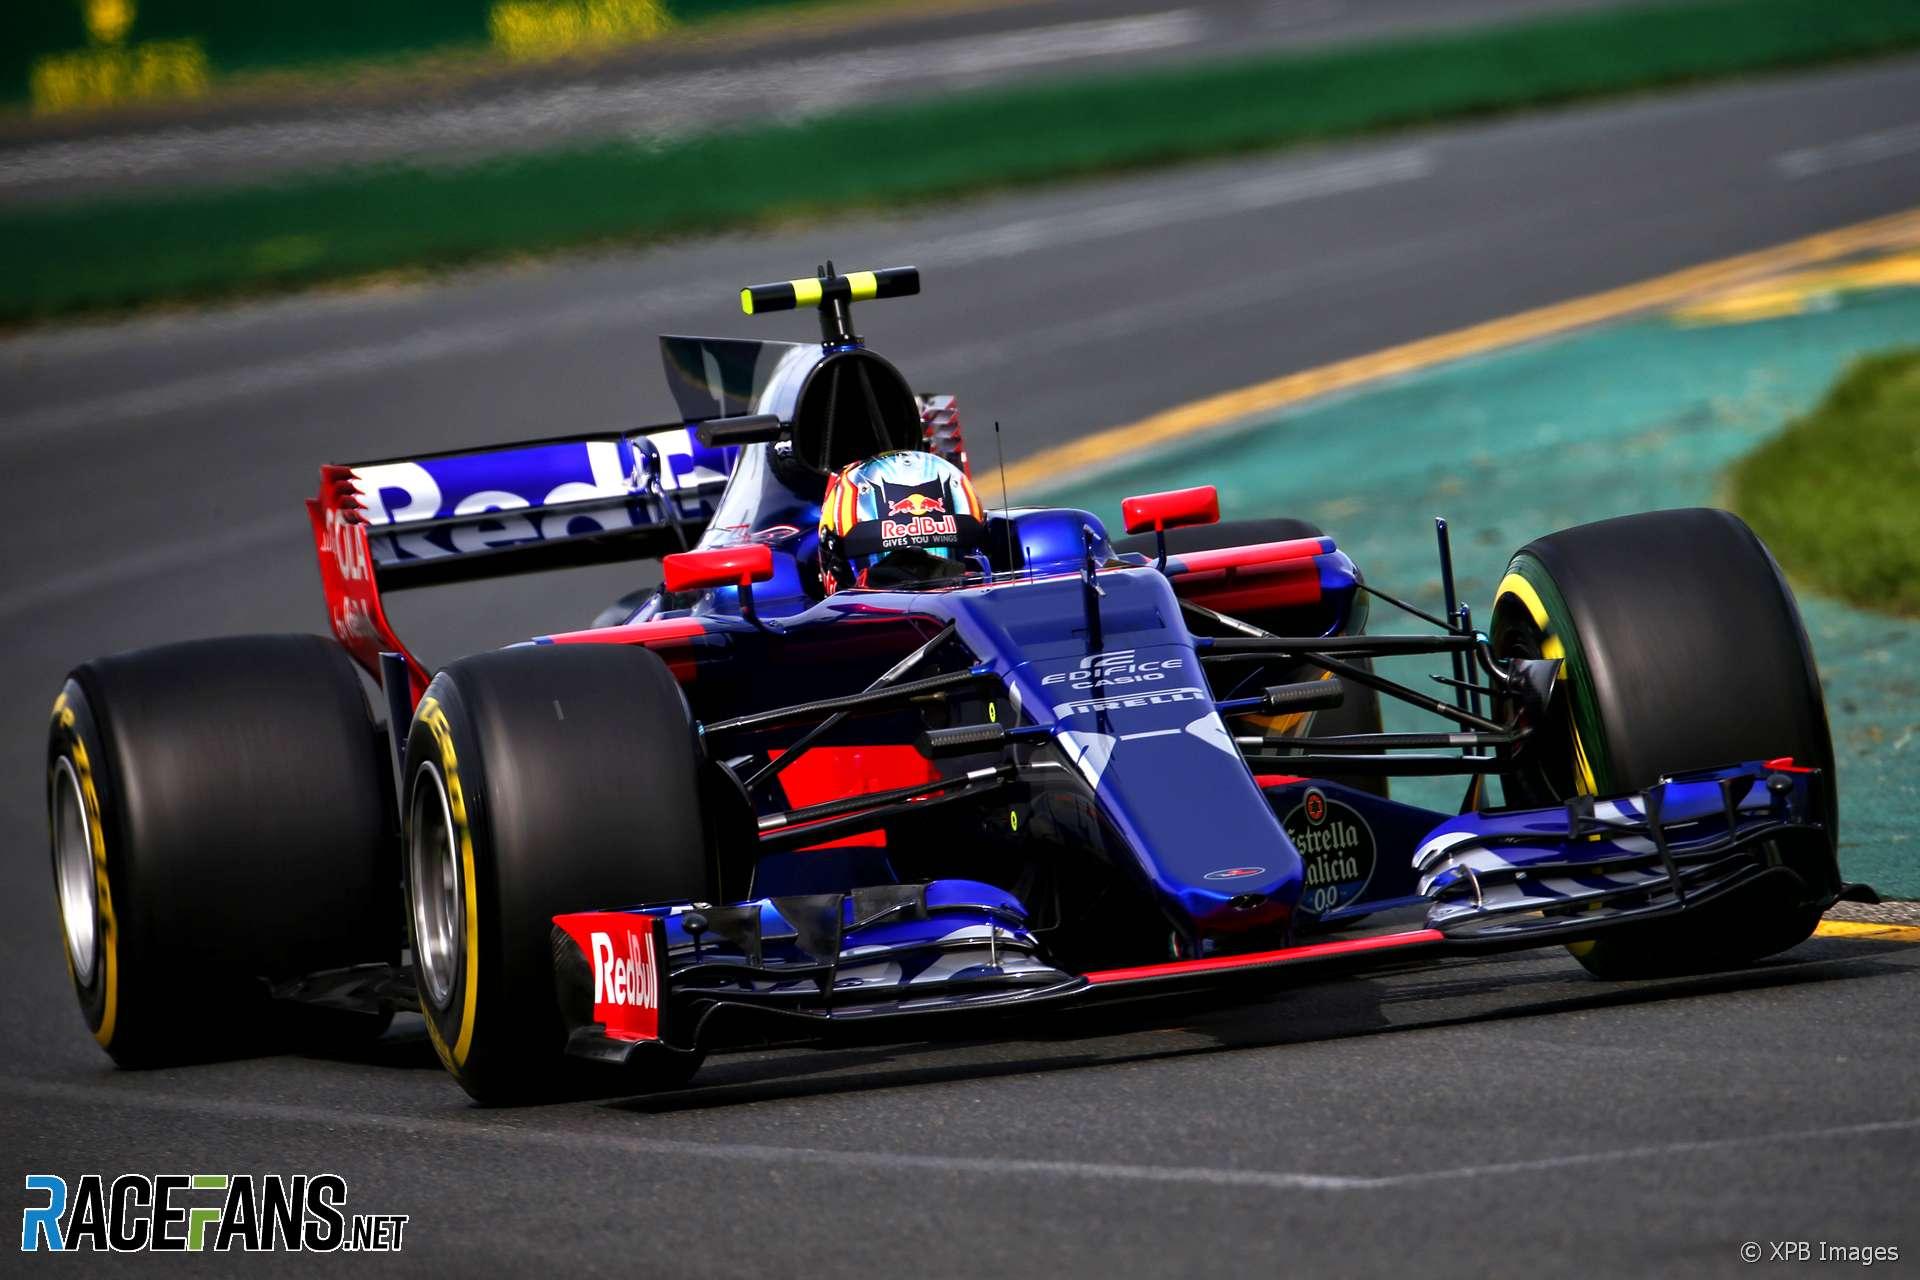 Carlos Sainz Jr., Toro Rosso, Melbourne, 2017